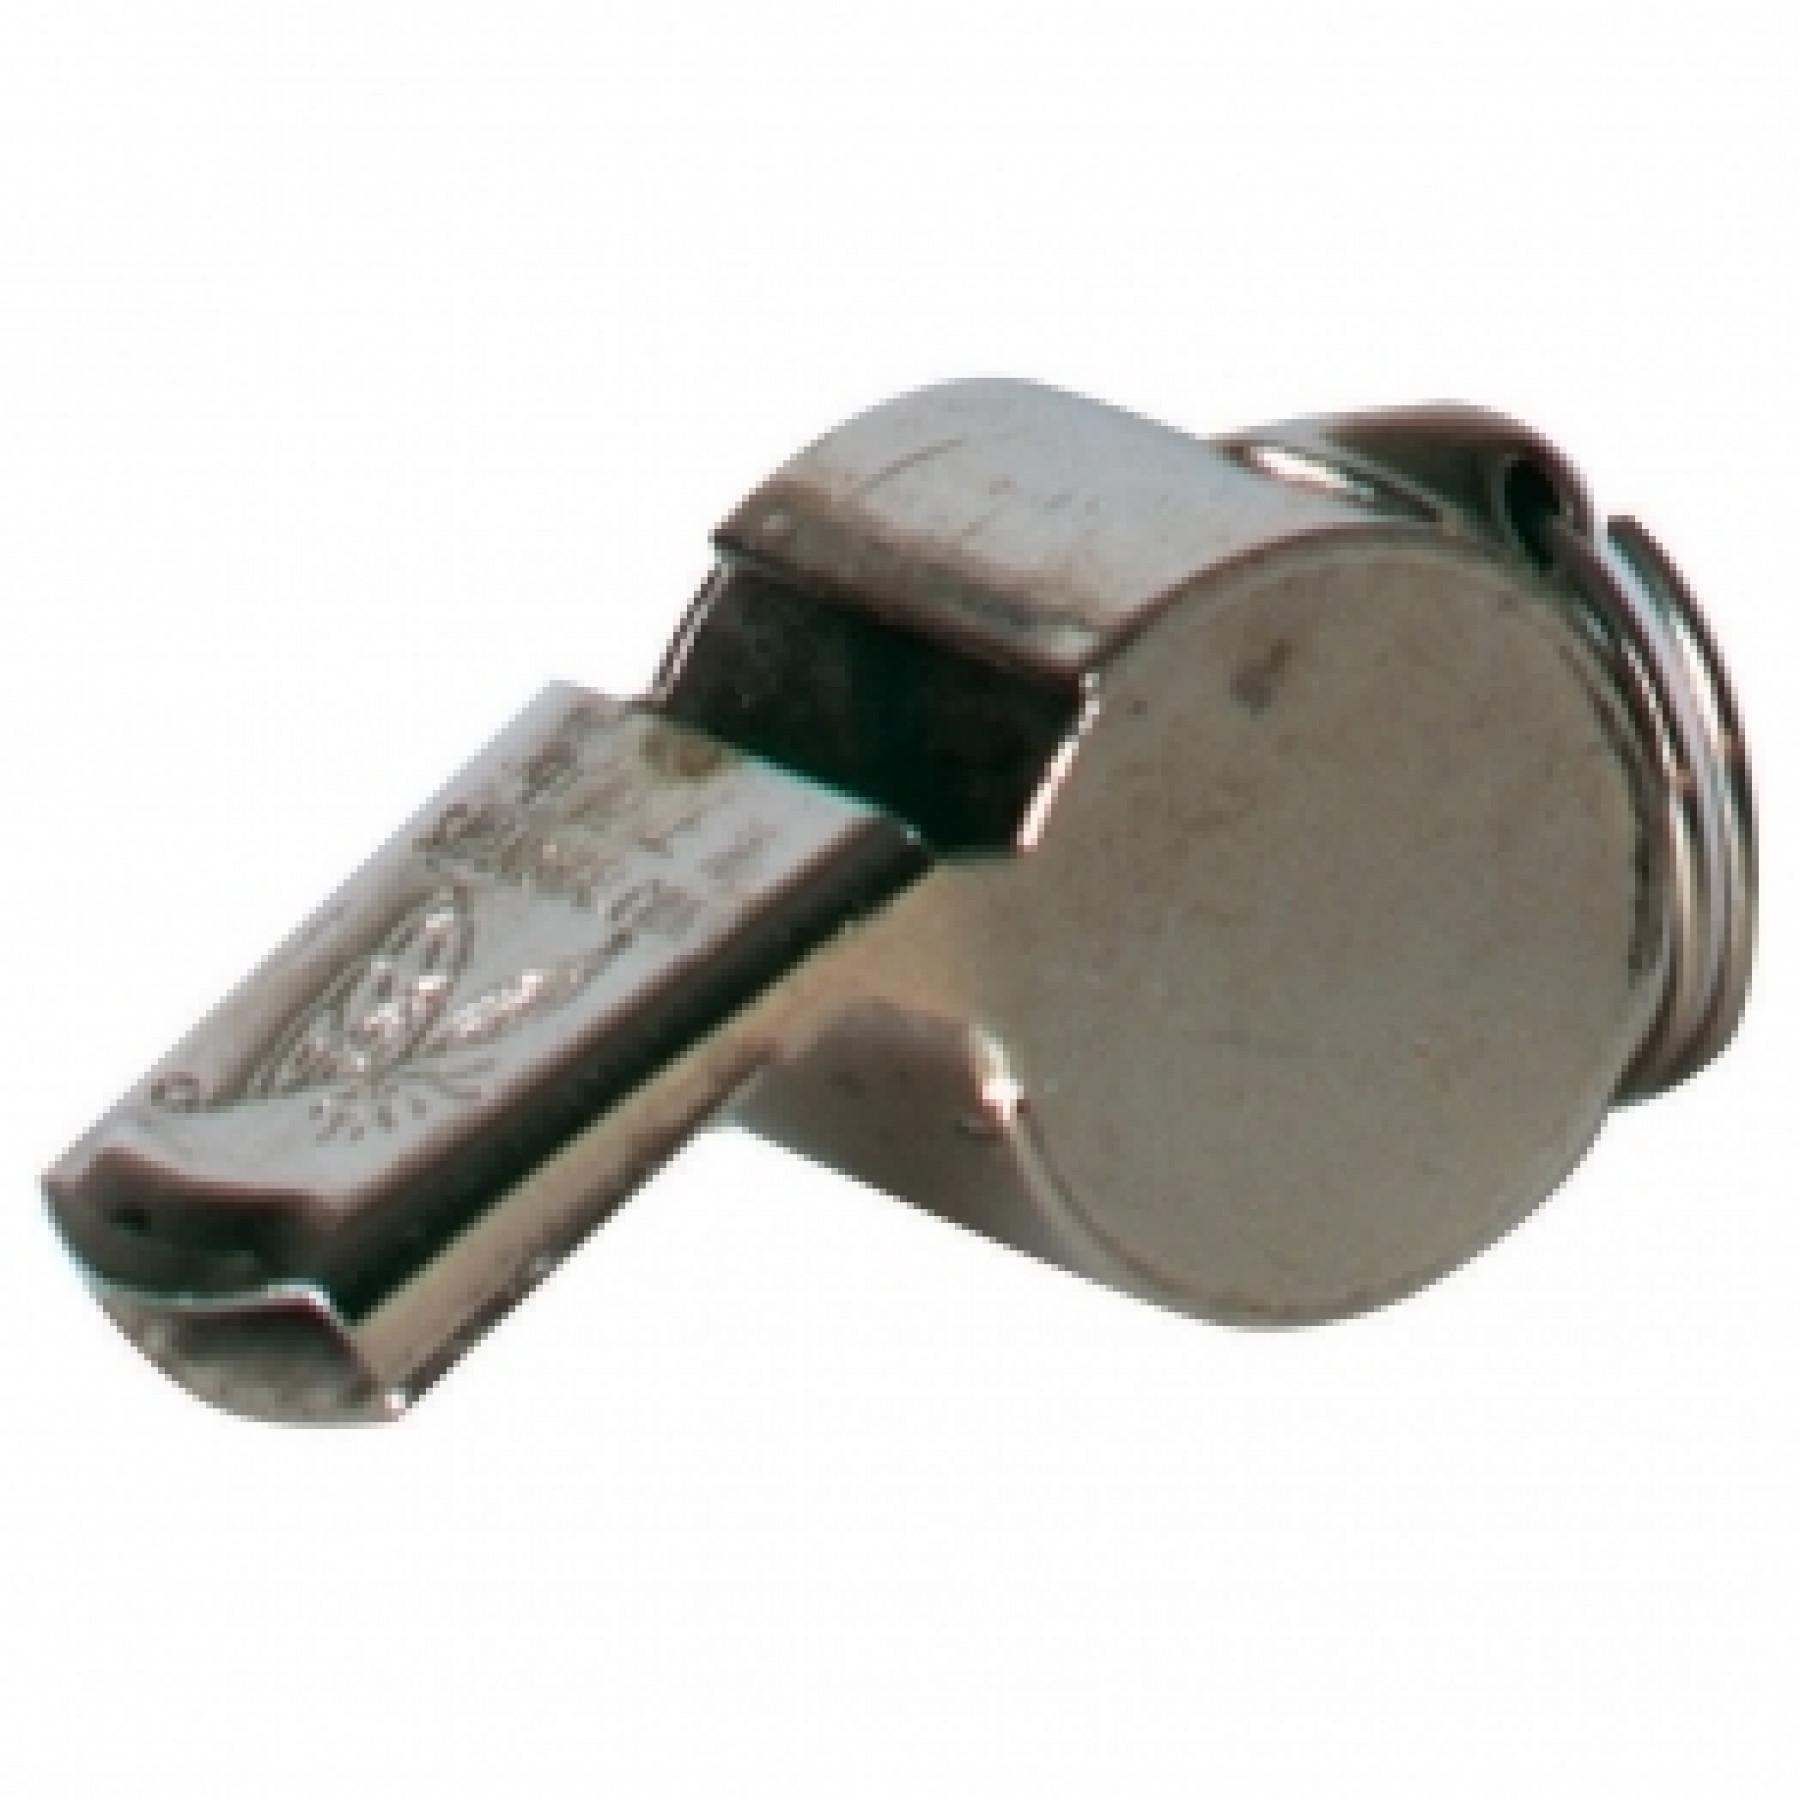 Set of 12 Tremblay metal whistles